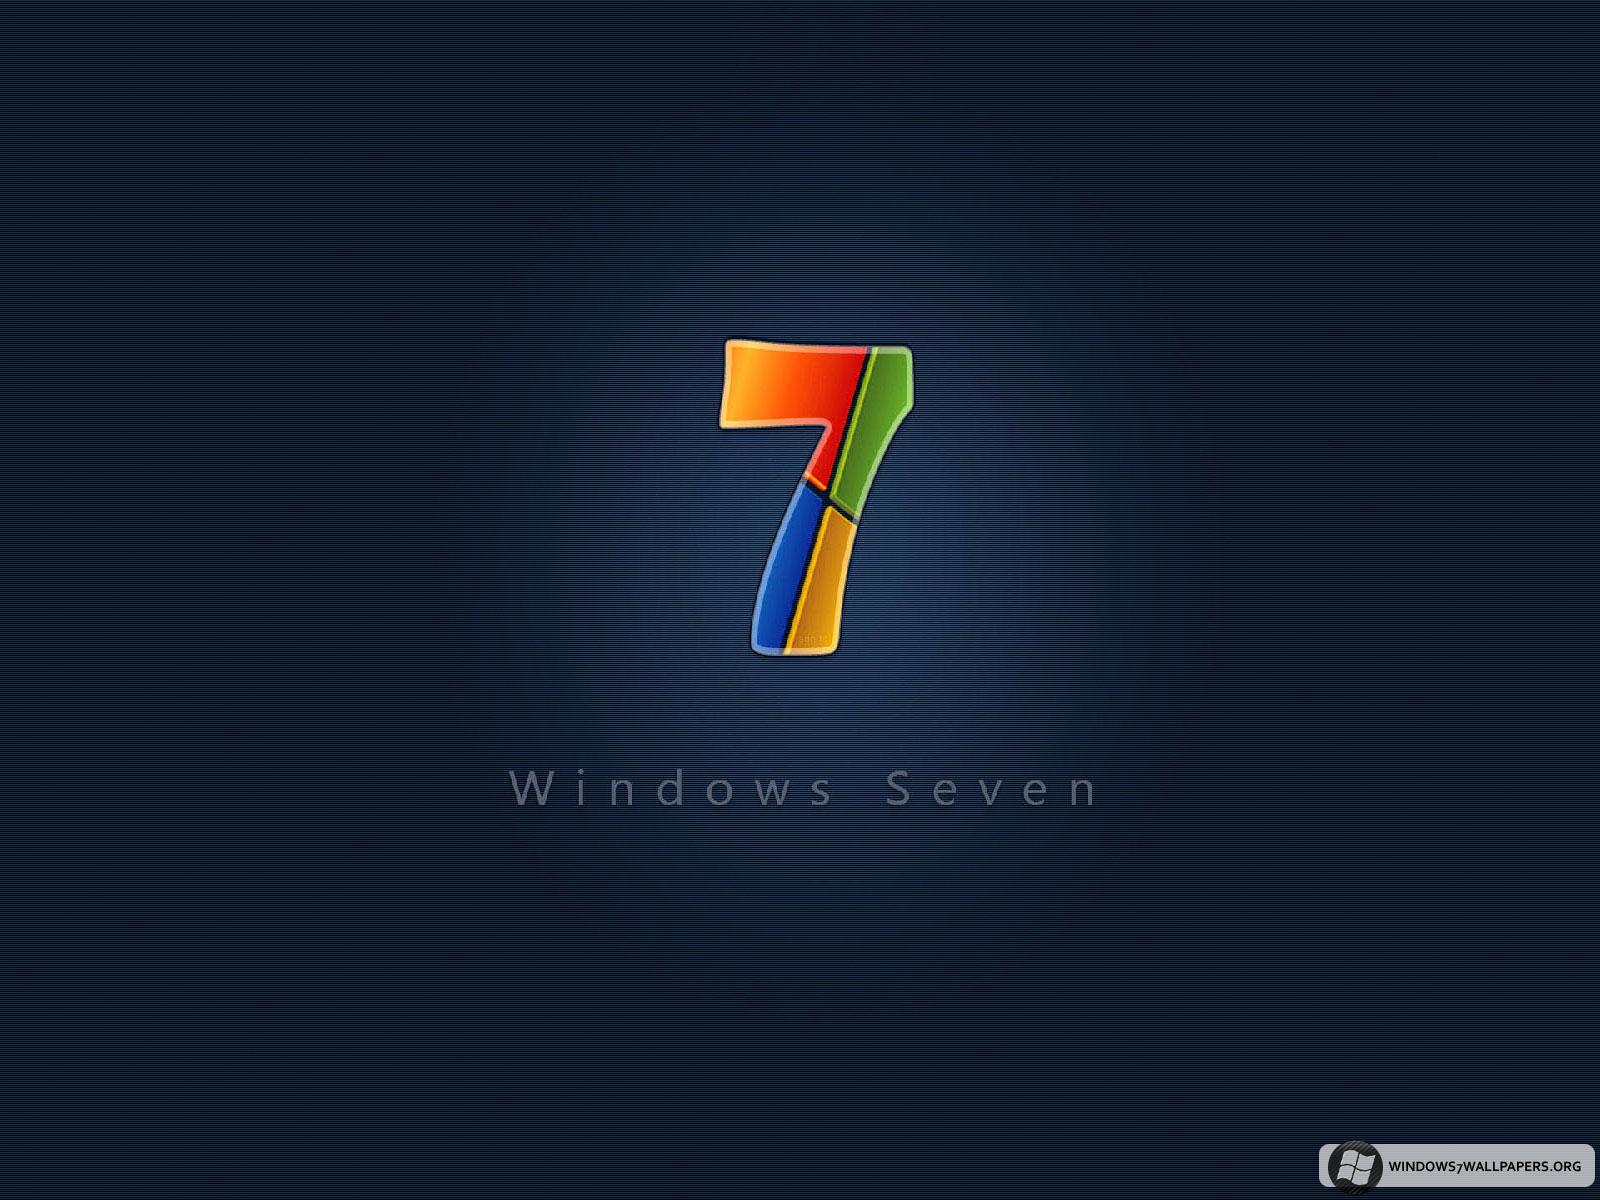 windows 7 wallpapers desktop moving desktop backgrounds for windows 7 1600x1200